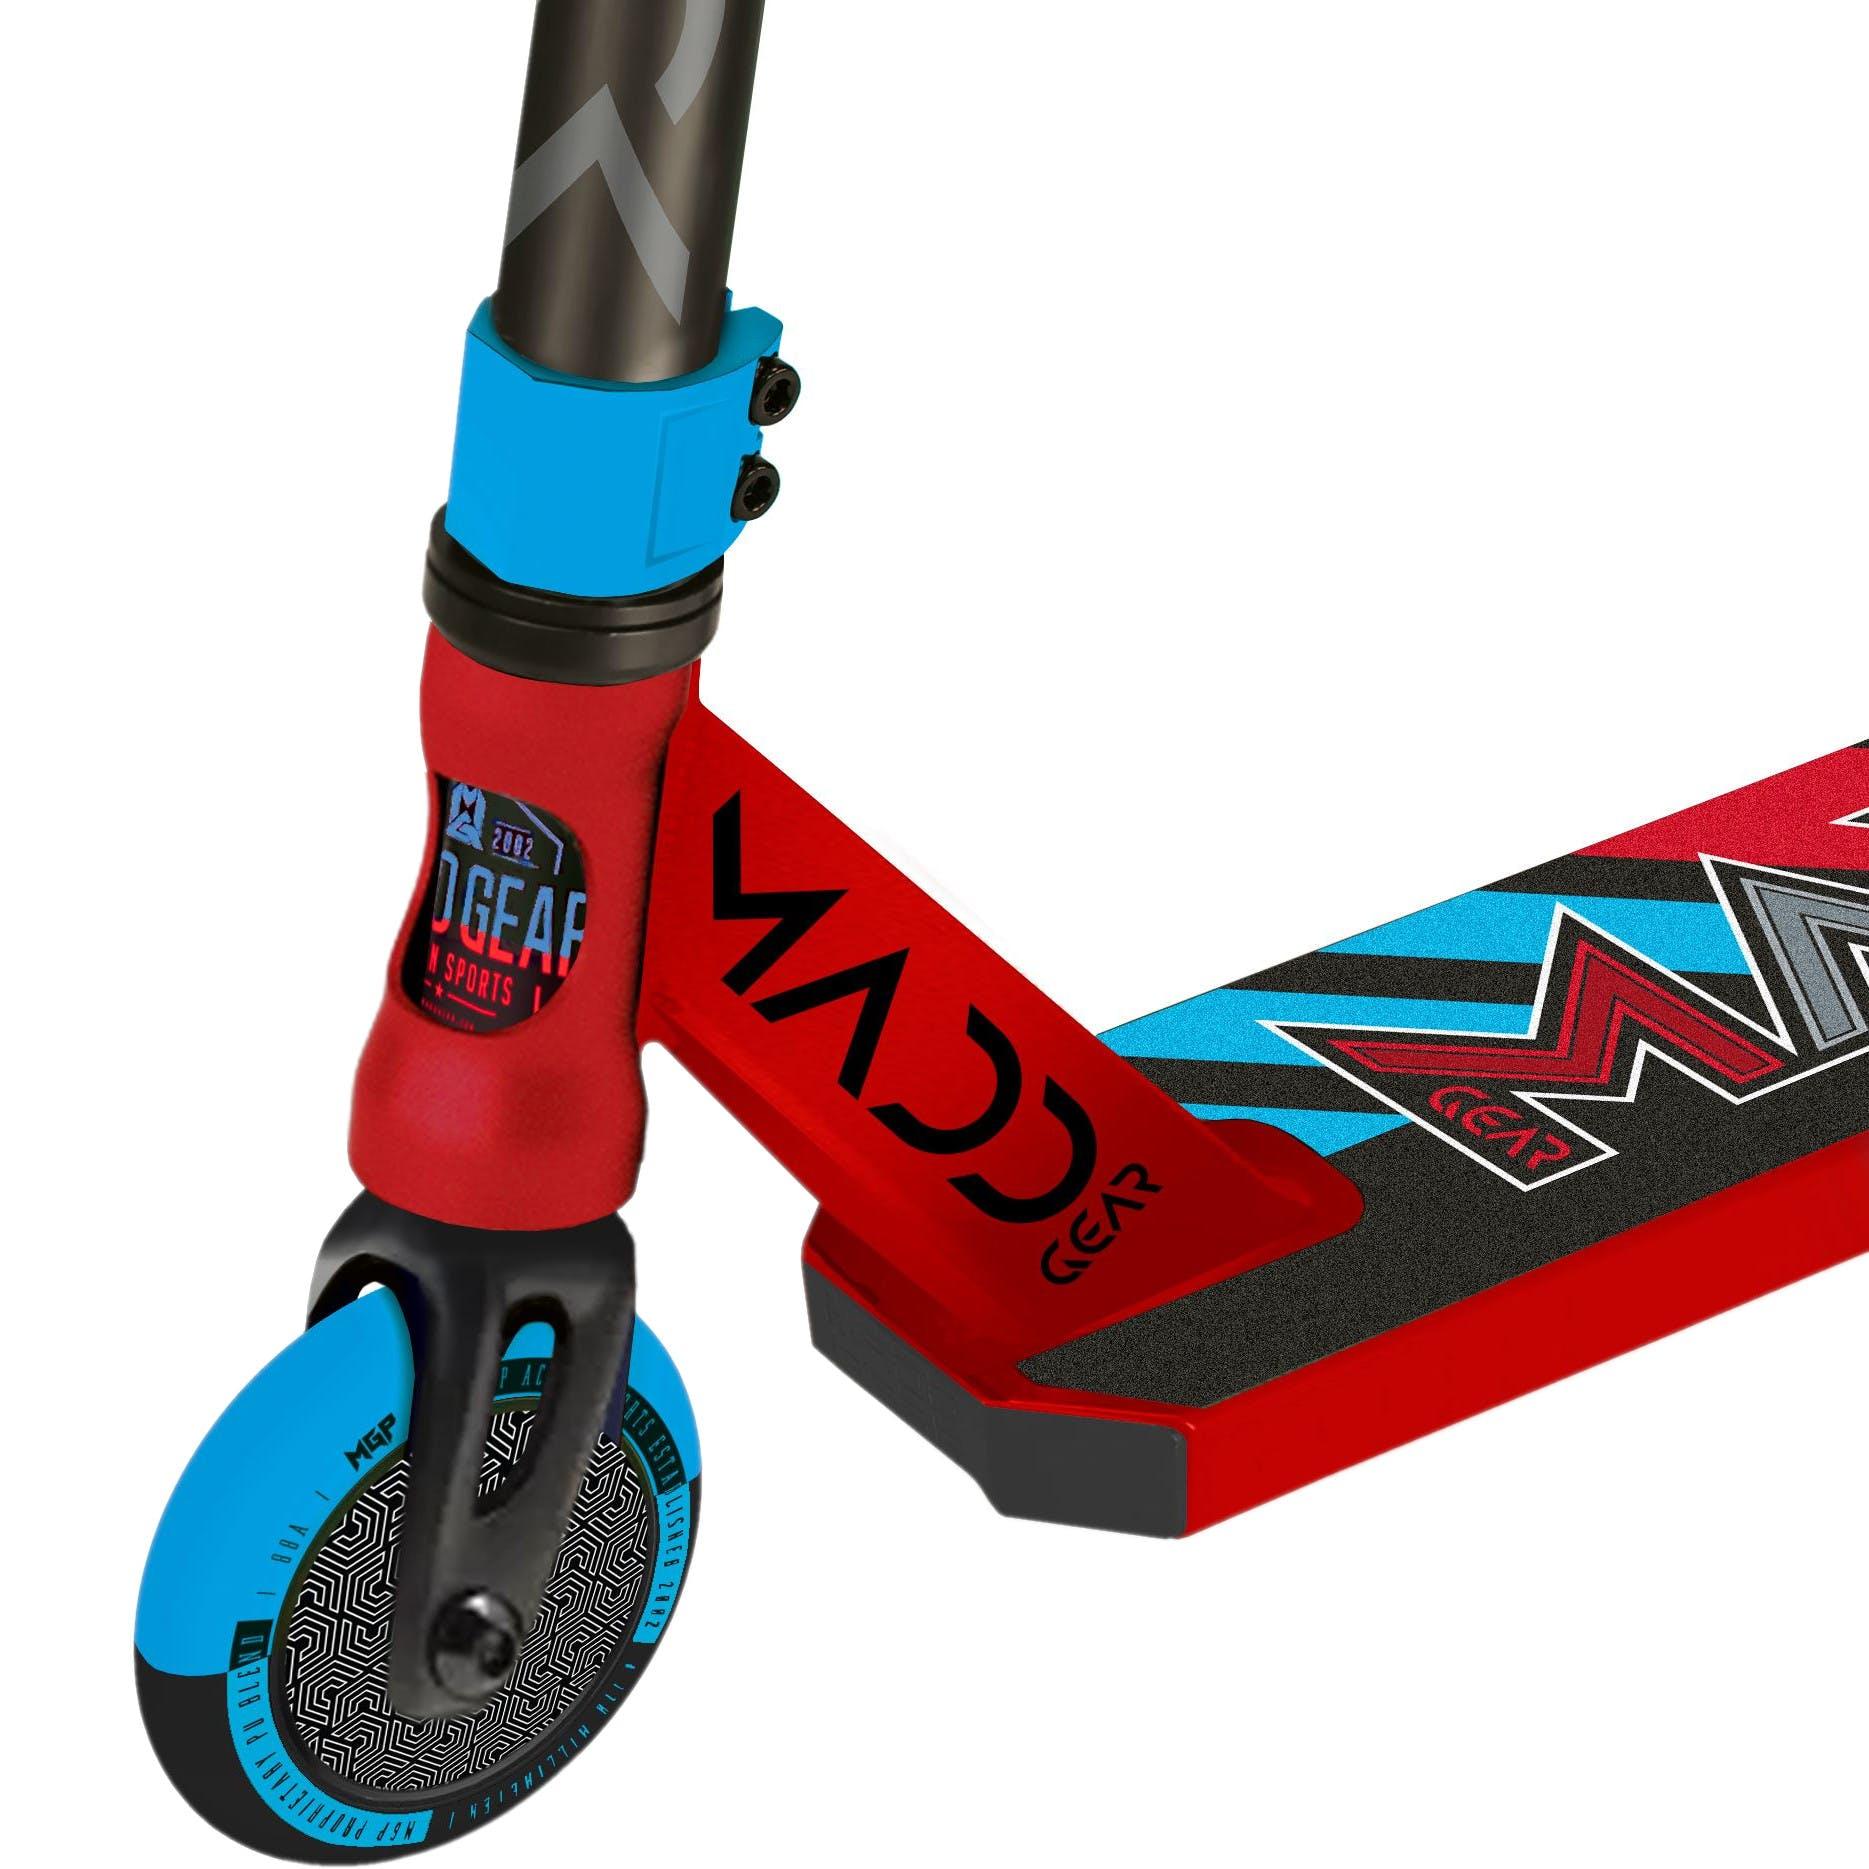 madd kick pro v5 stunt scooter red blue